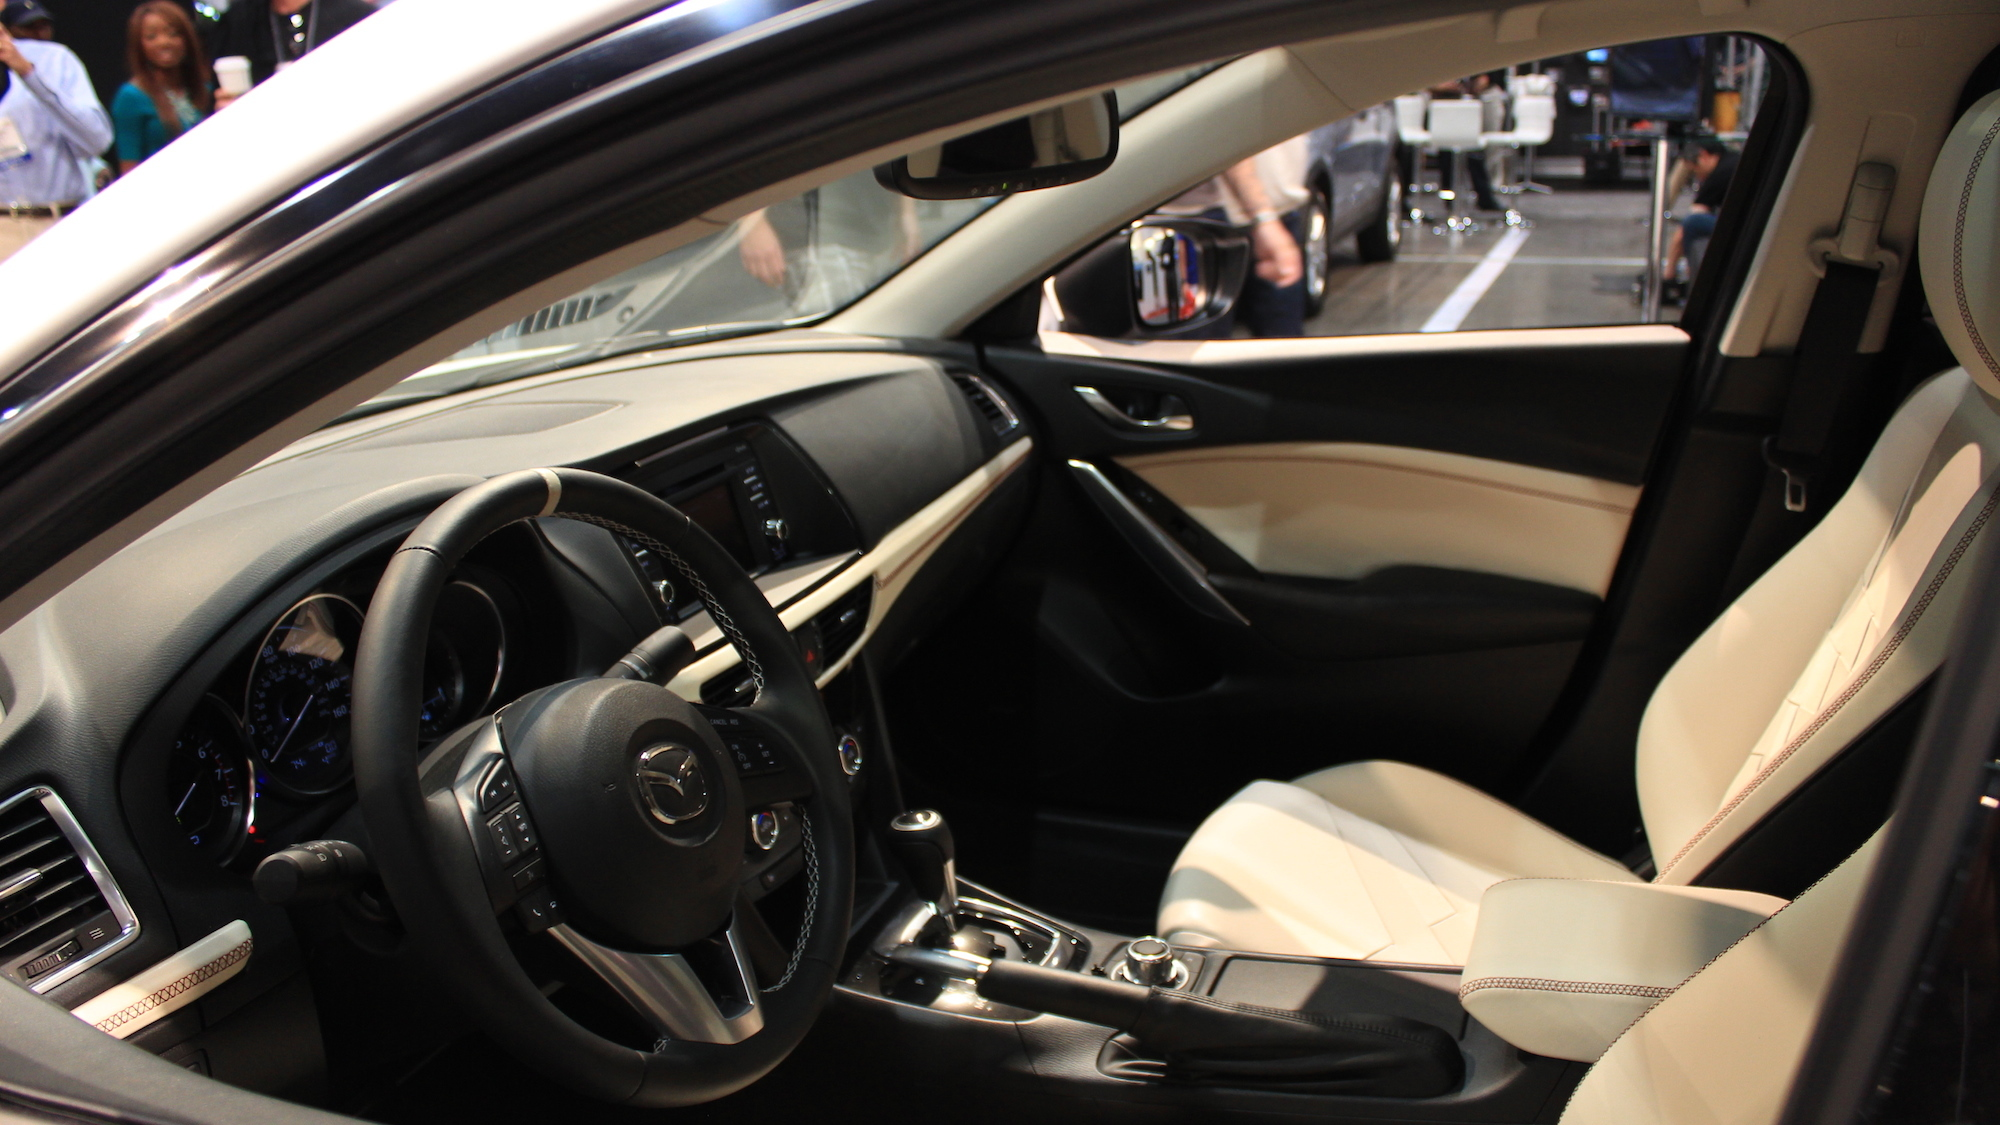 Mazda Ceramic 6 Concept, 2013 SEMA Show